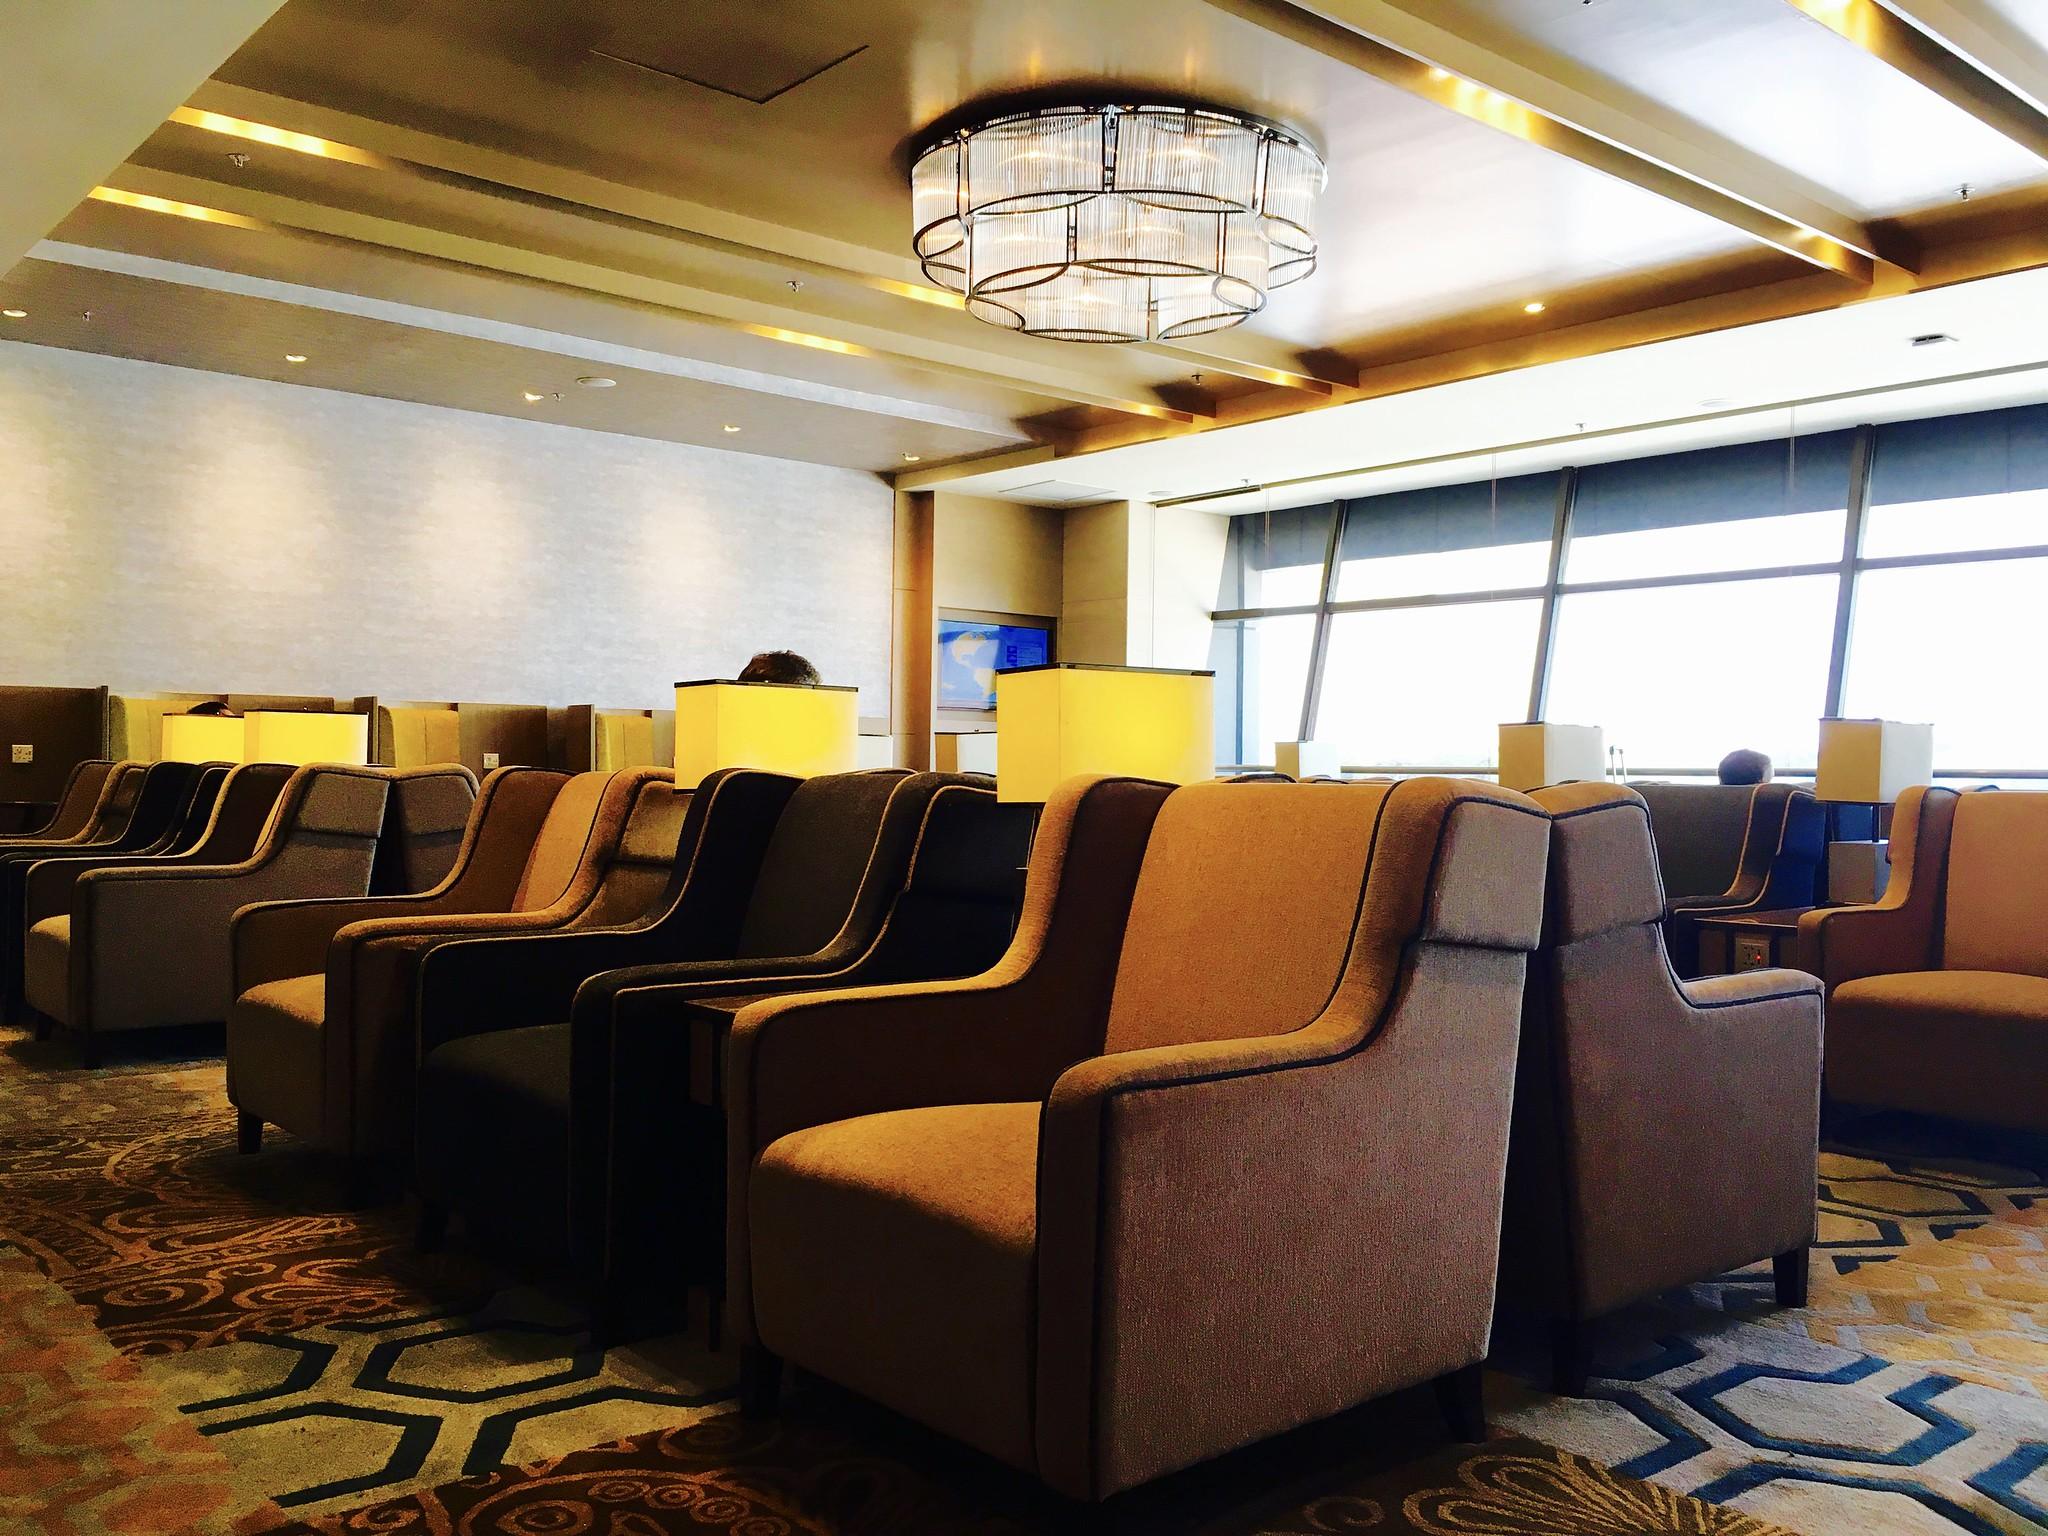 Plaza Premium Lounge @ Changi Airport Terminal 1